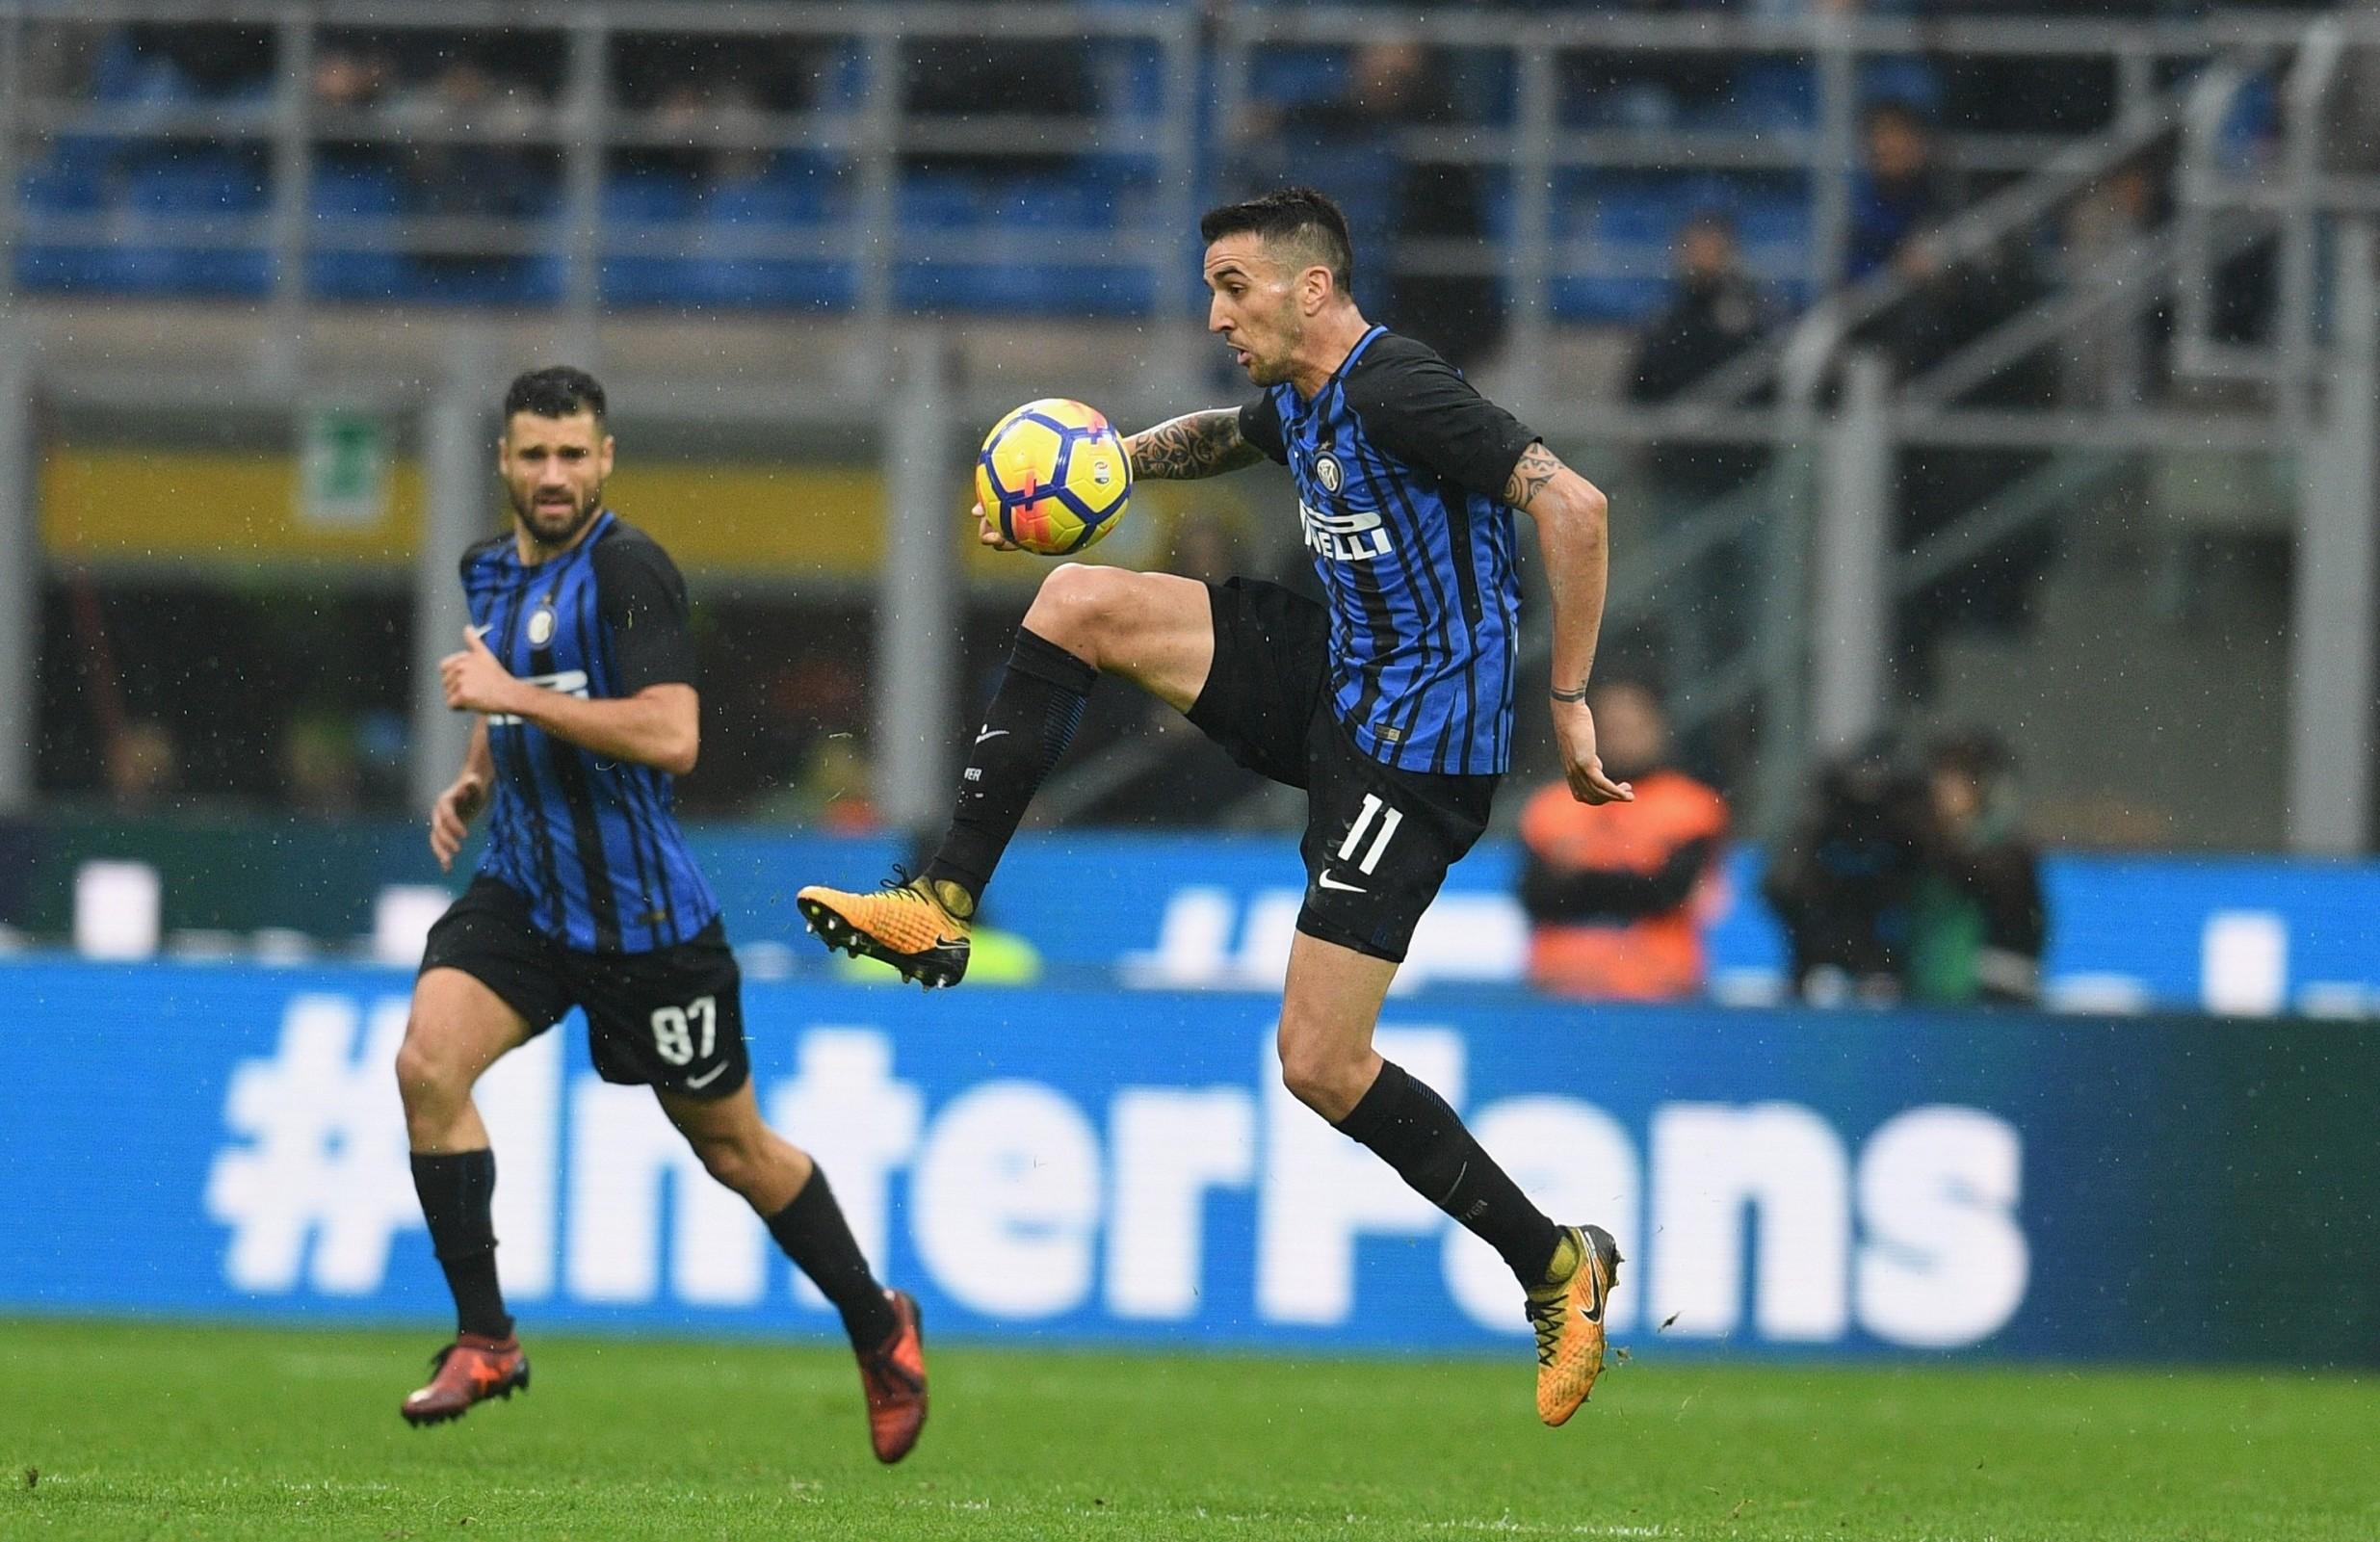 Inter Udinese streaming gratis live. No